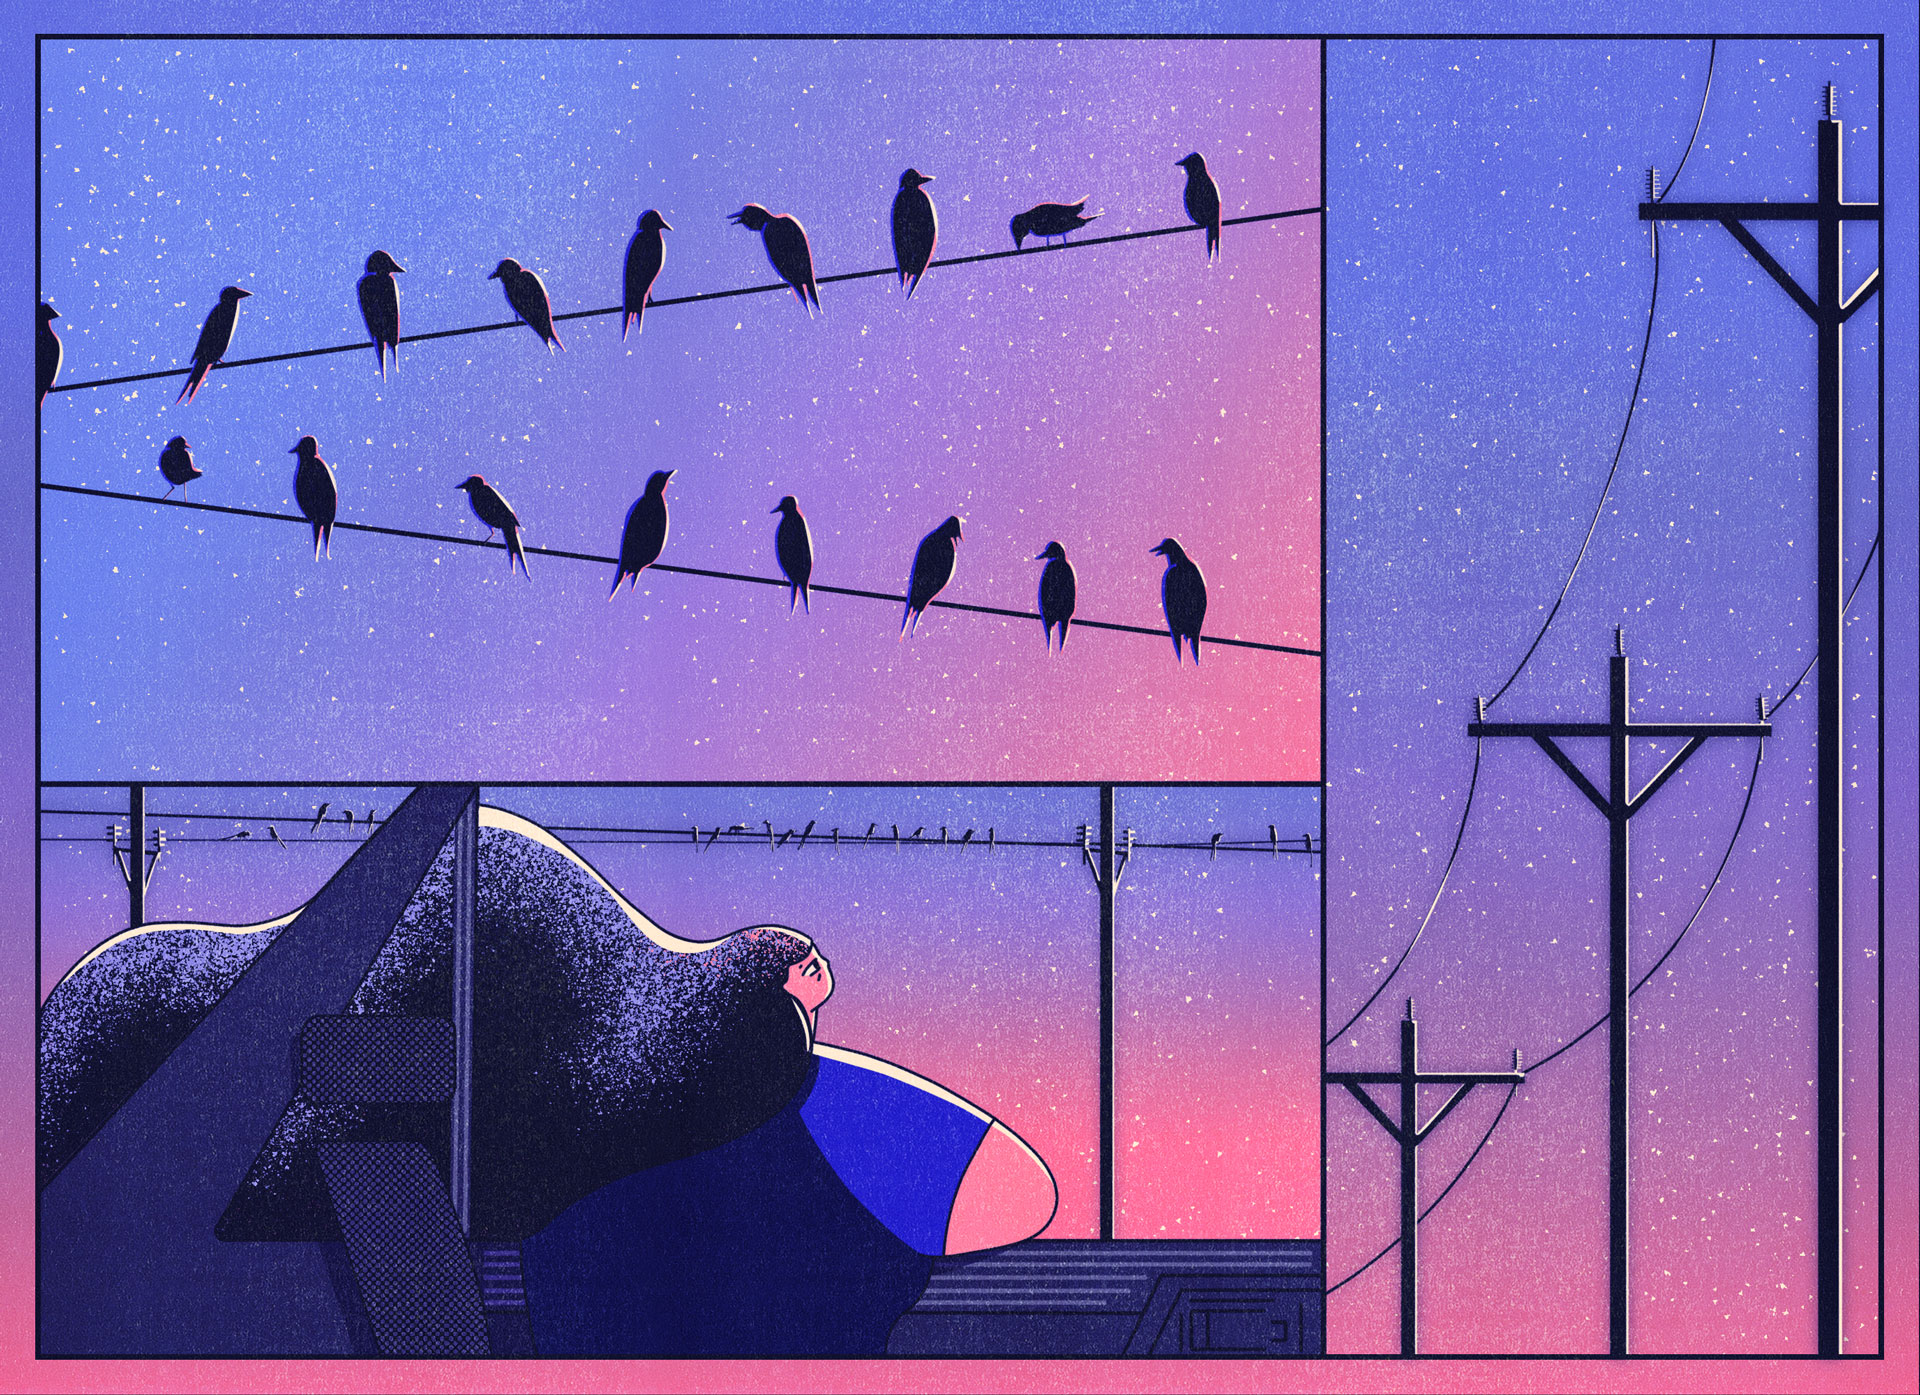 3.birds